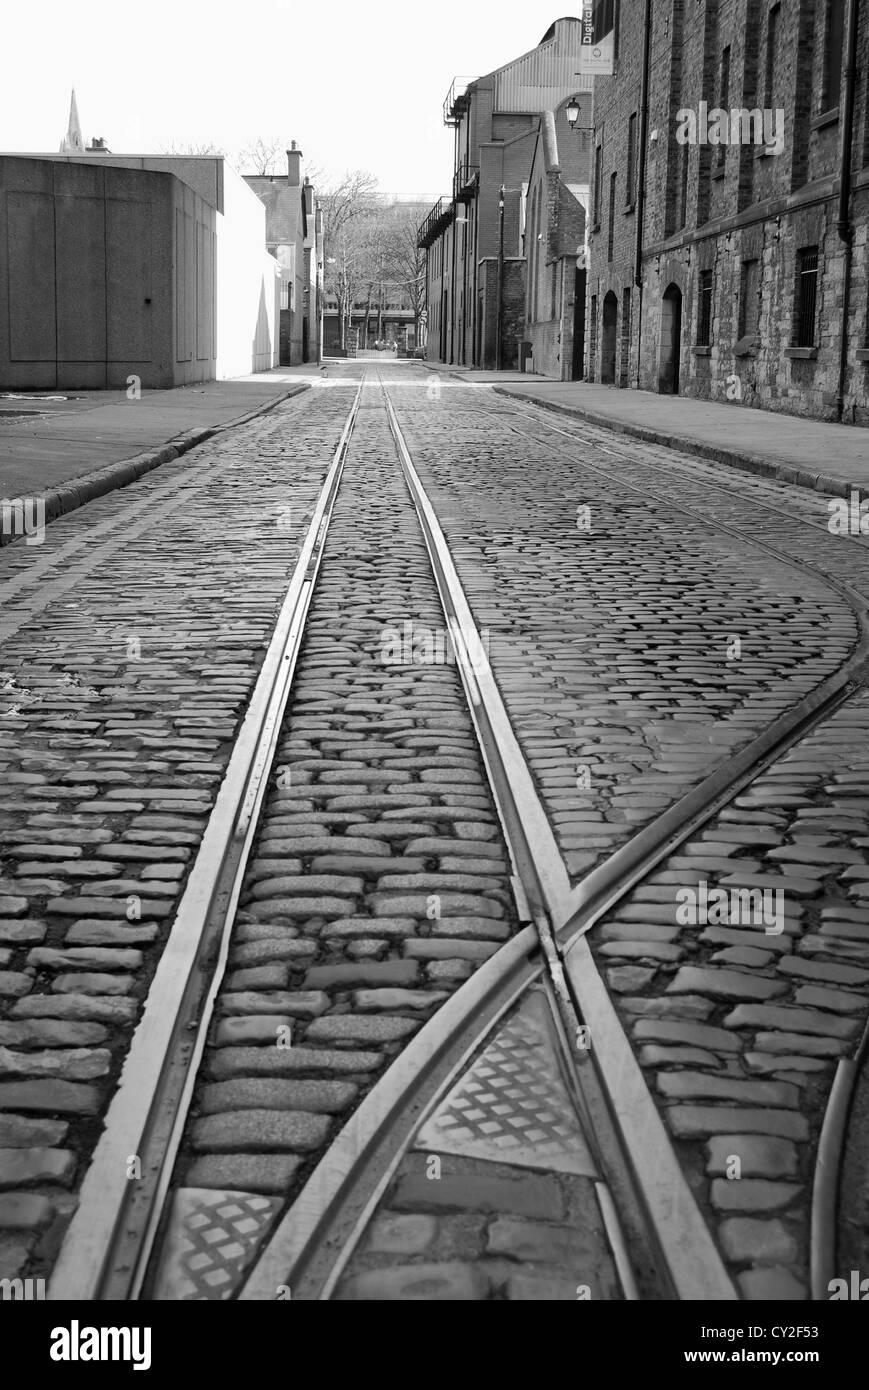 tramway dublin street no 3235 - Stock Image